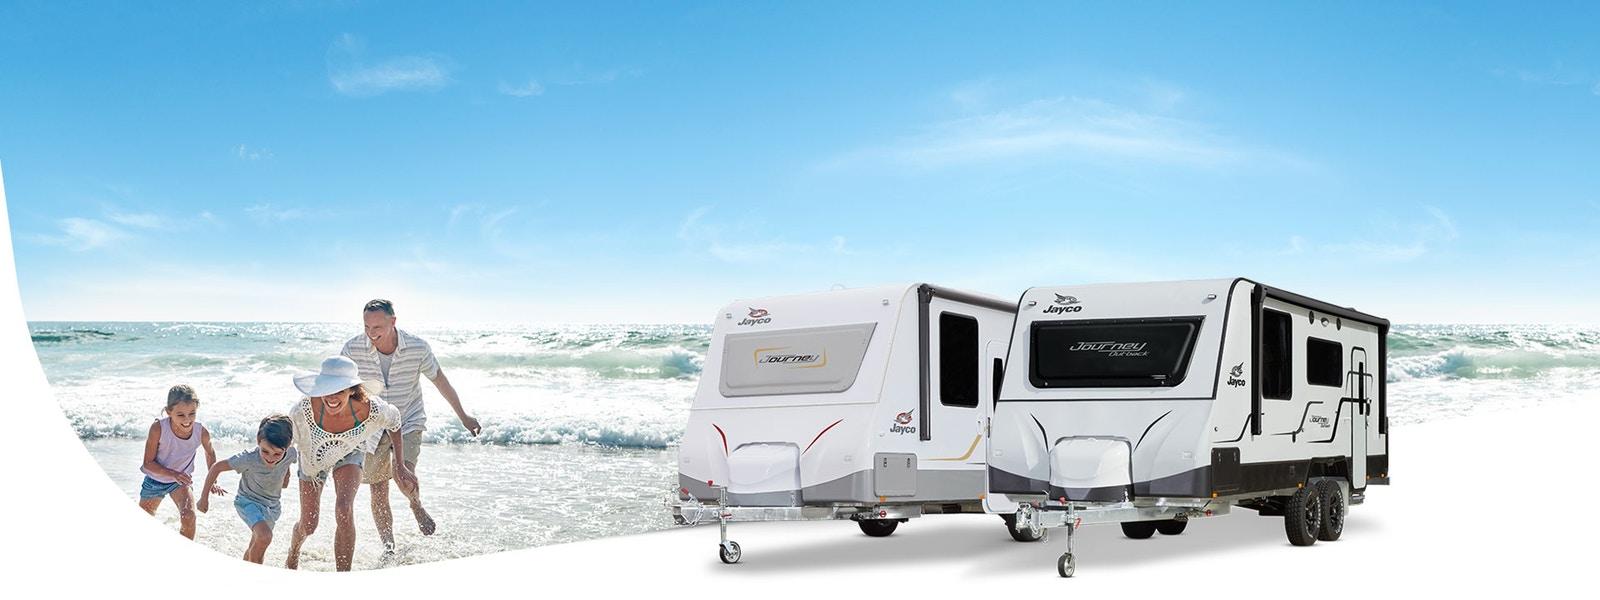 32zfJGYi7JjMkjVZXAWDWoGAk - 2020 Jayco Journey Caravan